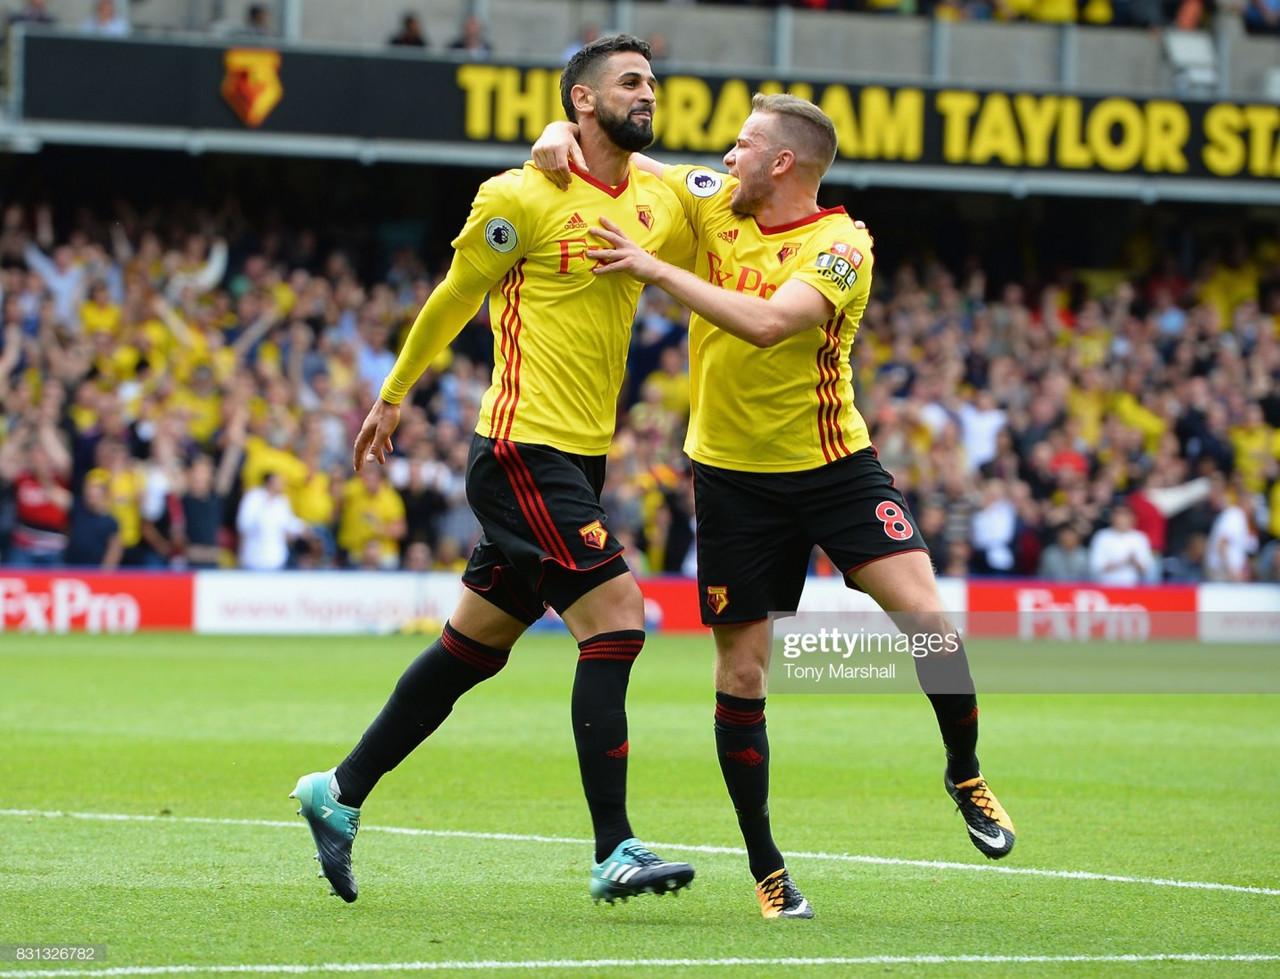 Memorable Match: Watford 3-3 Liverpool - Thriller opens 2017/18 season